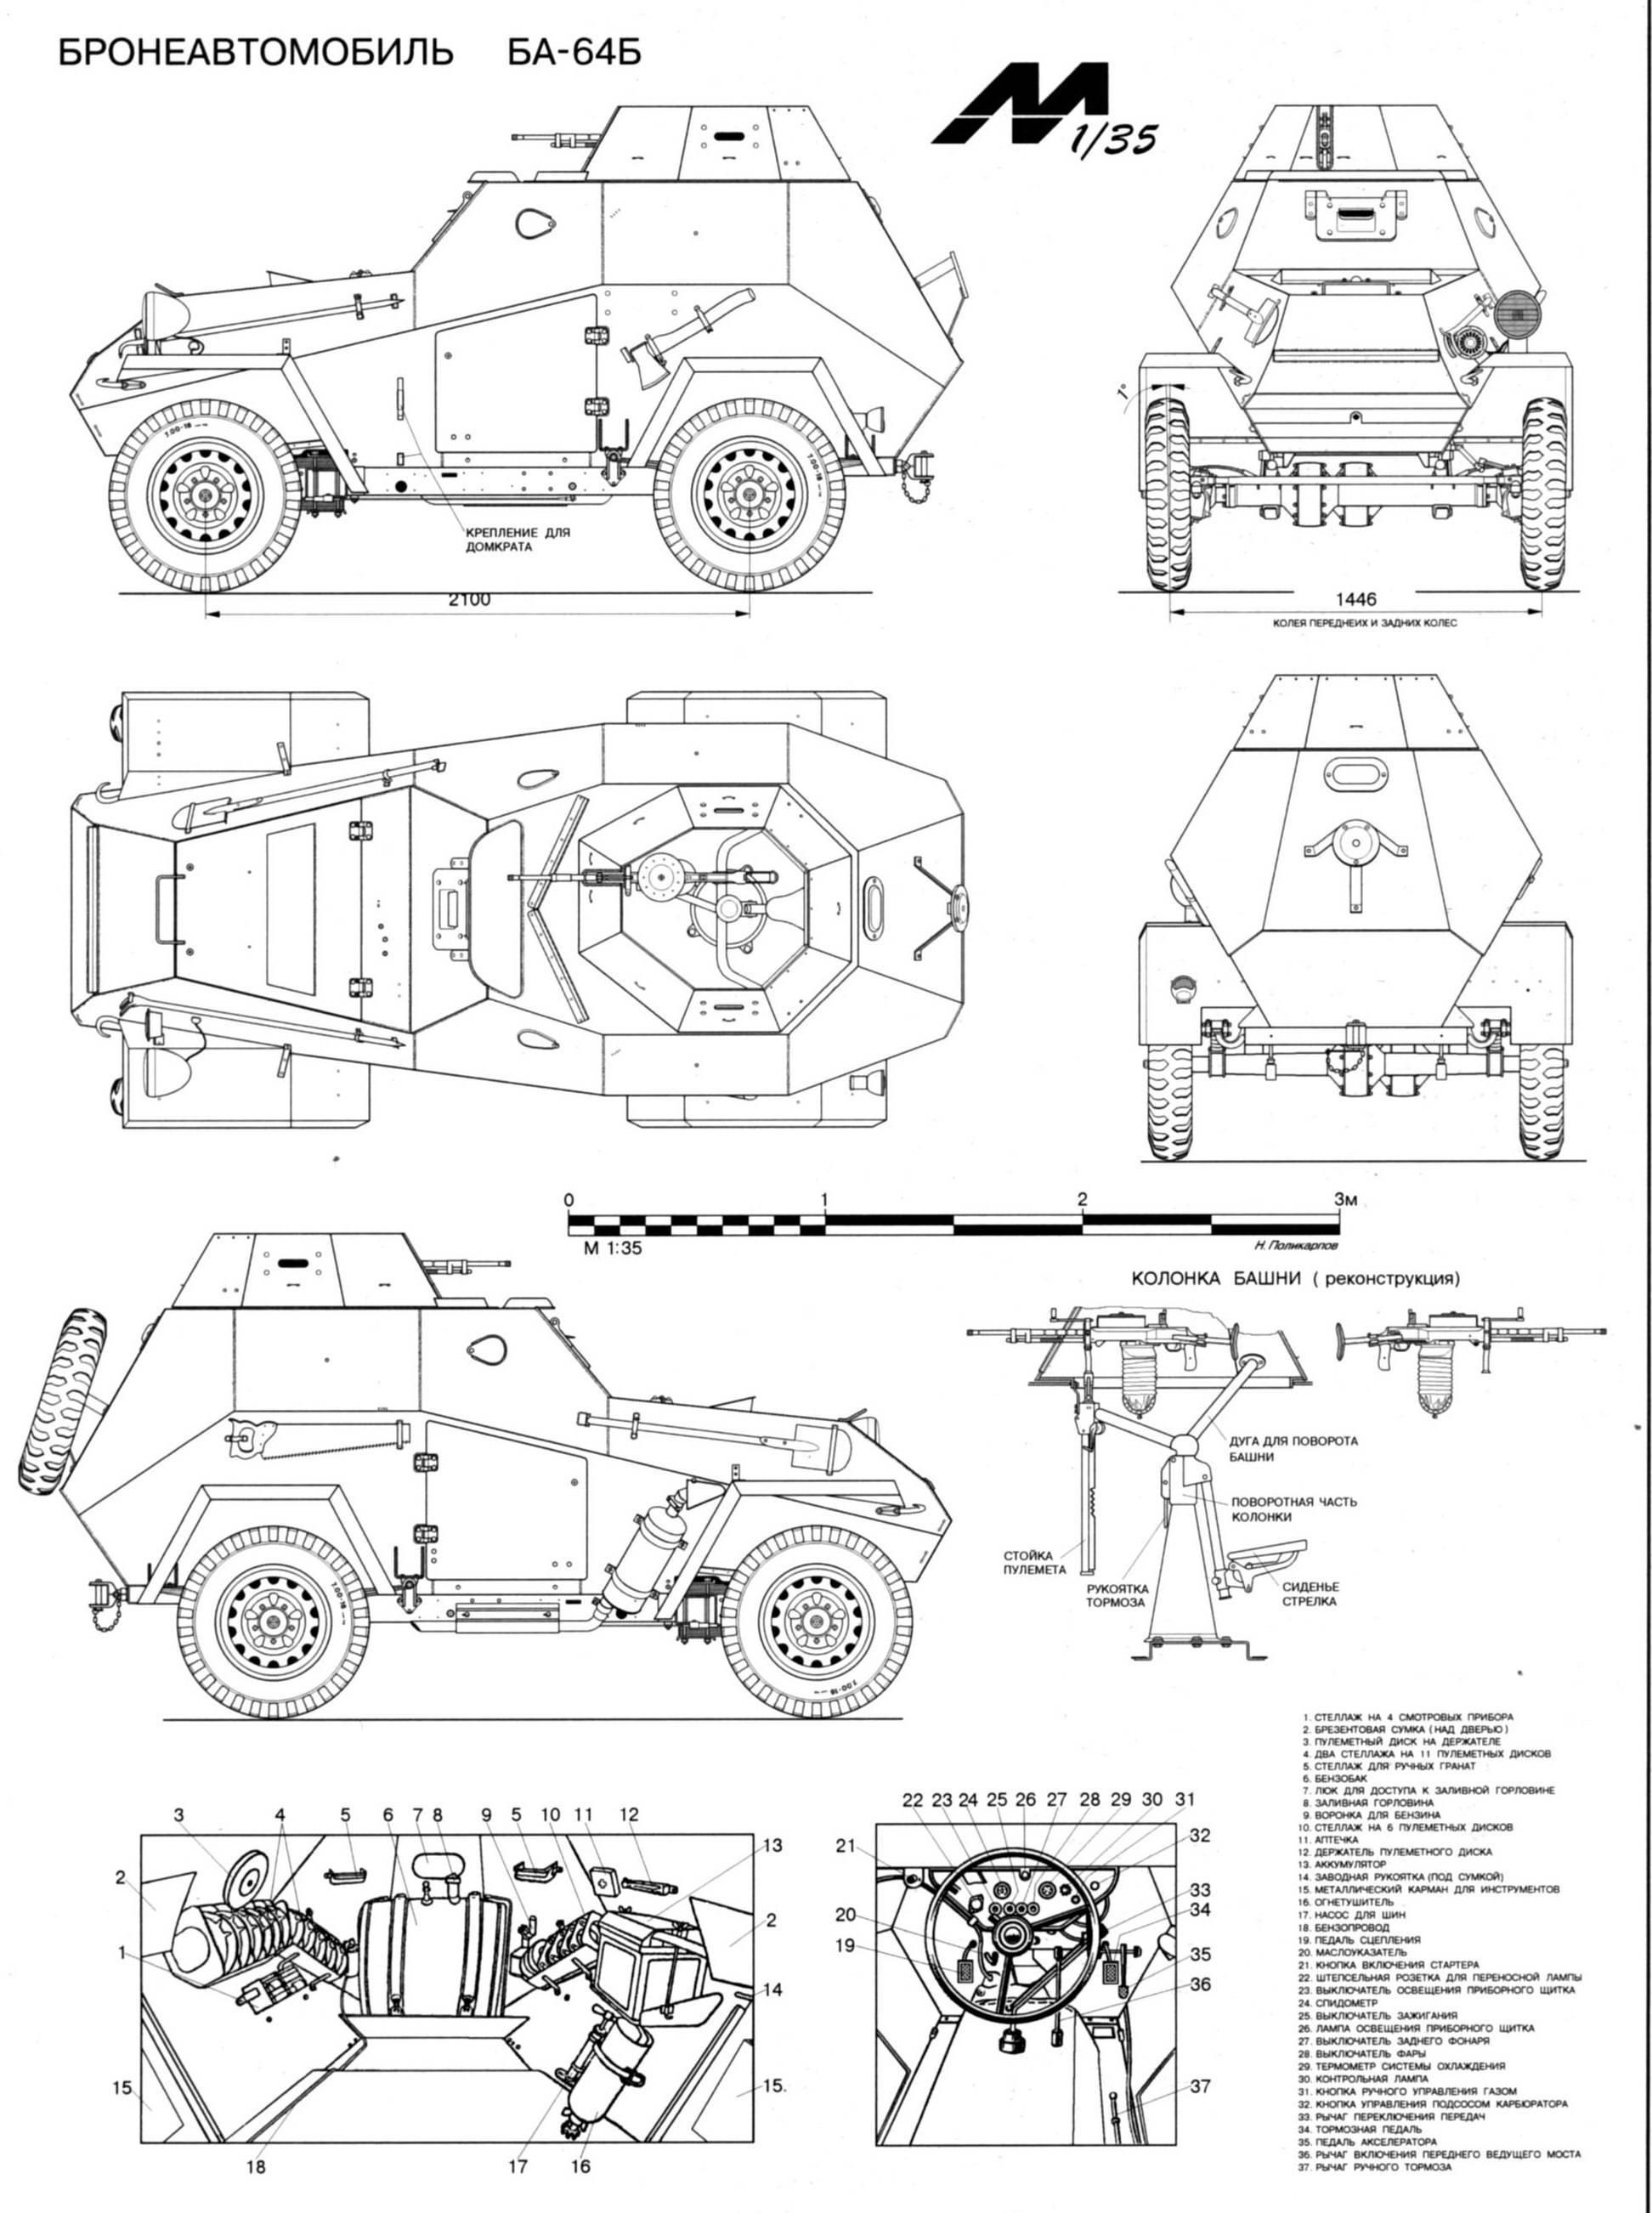 BA-64 armored car. Blueprints